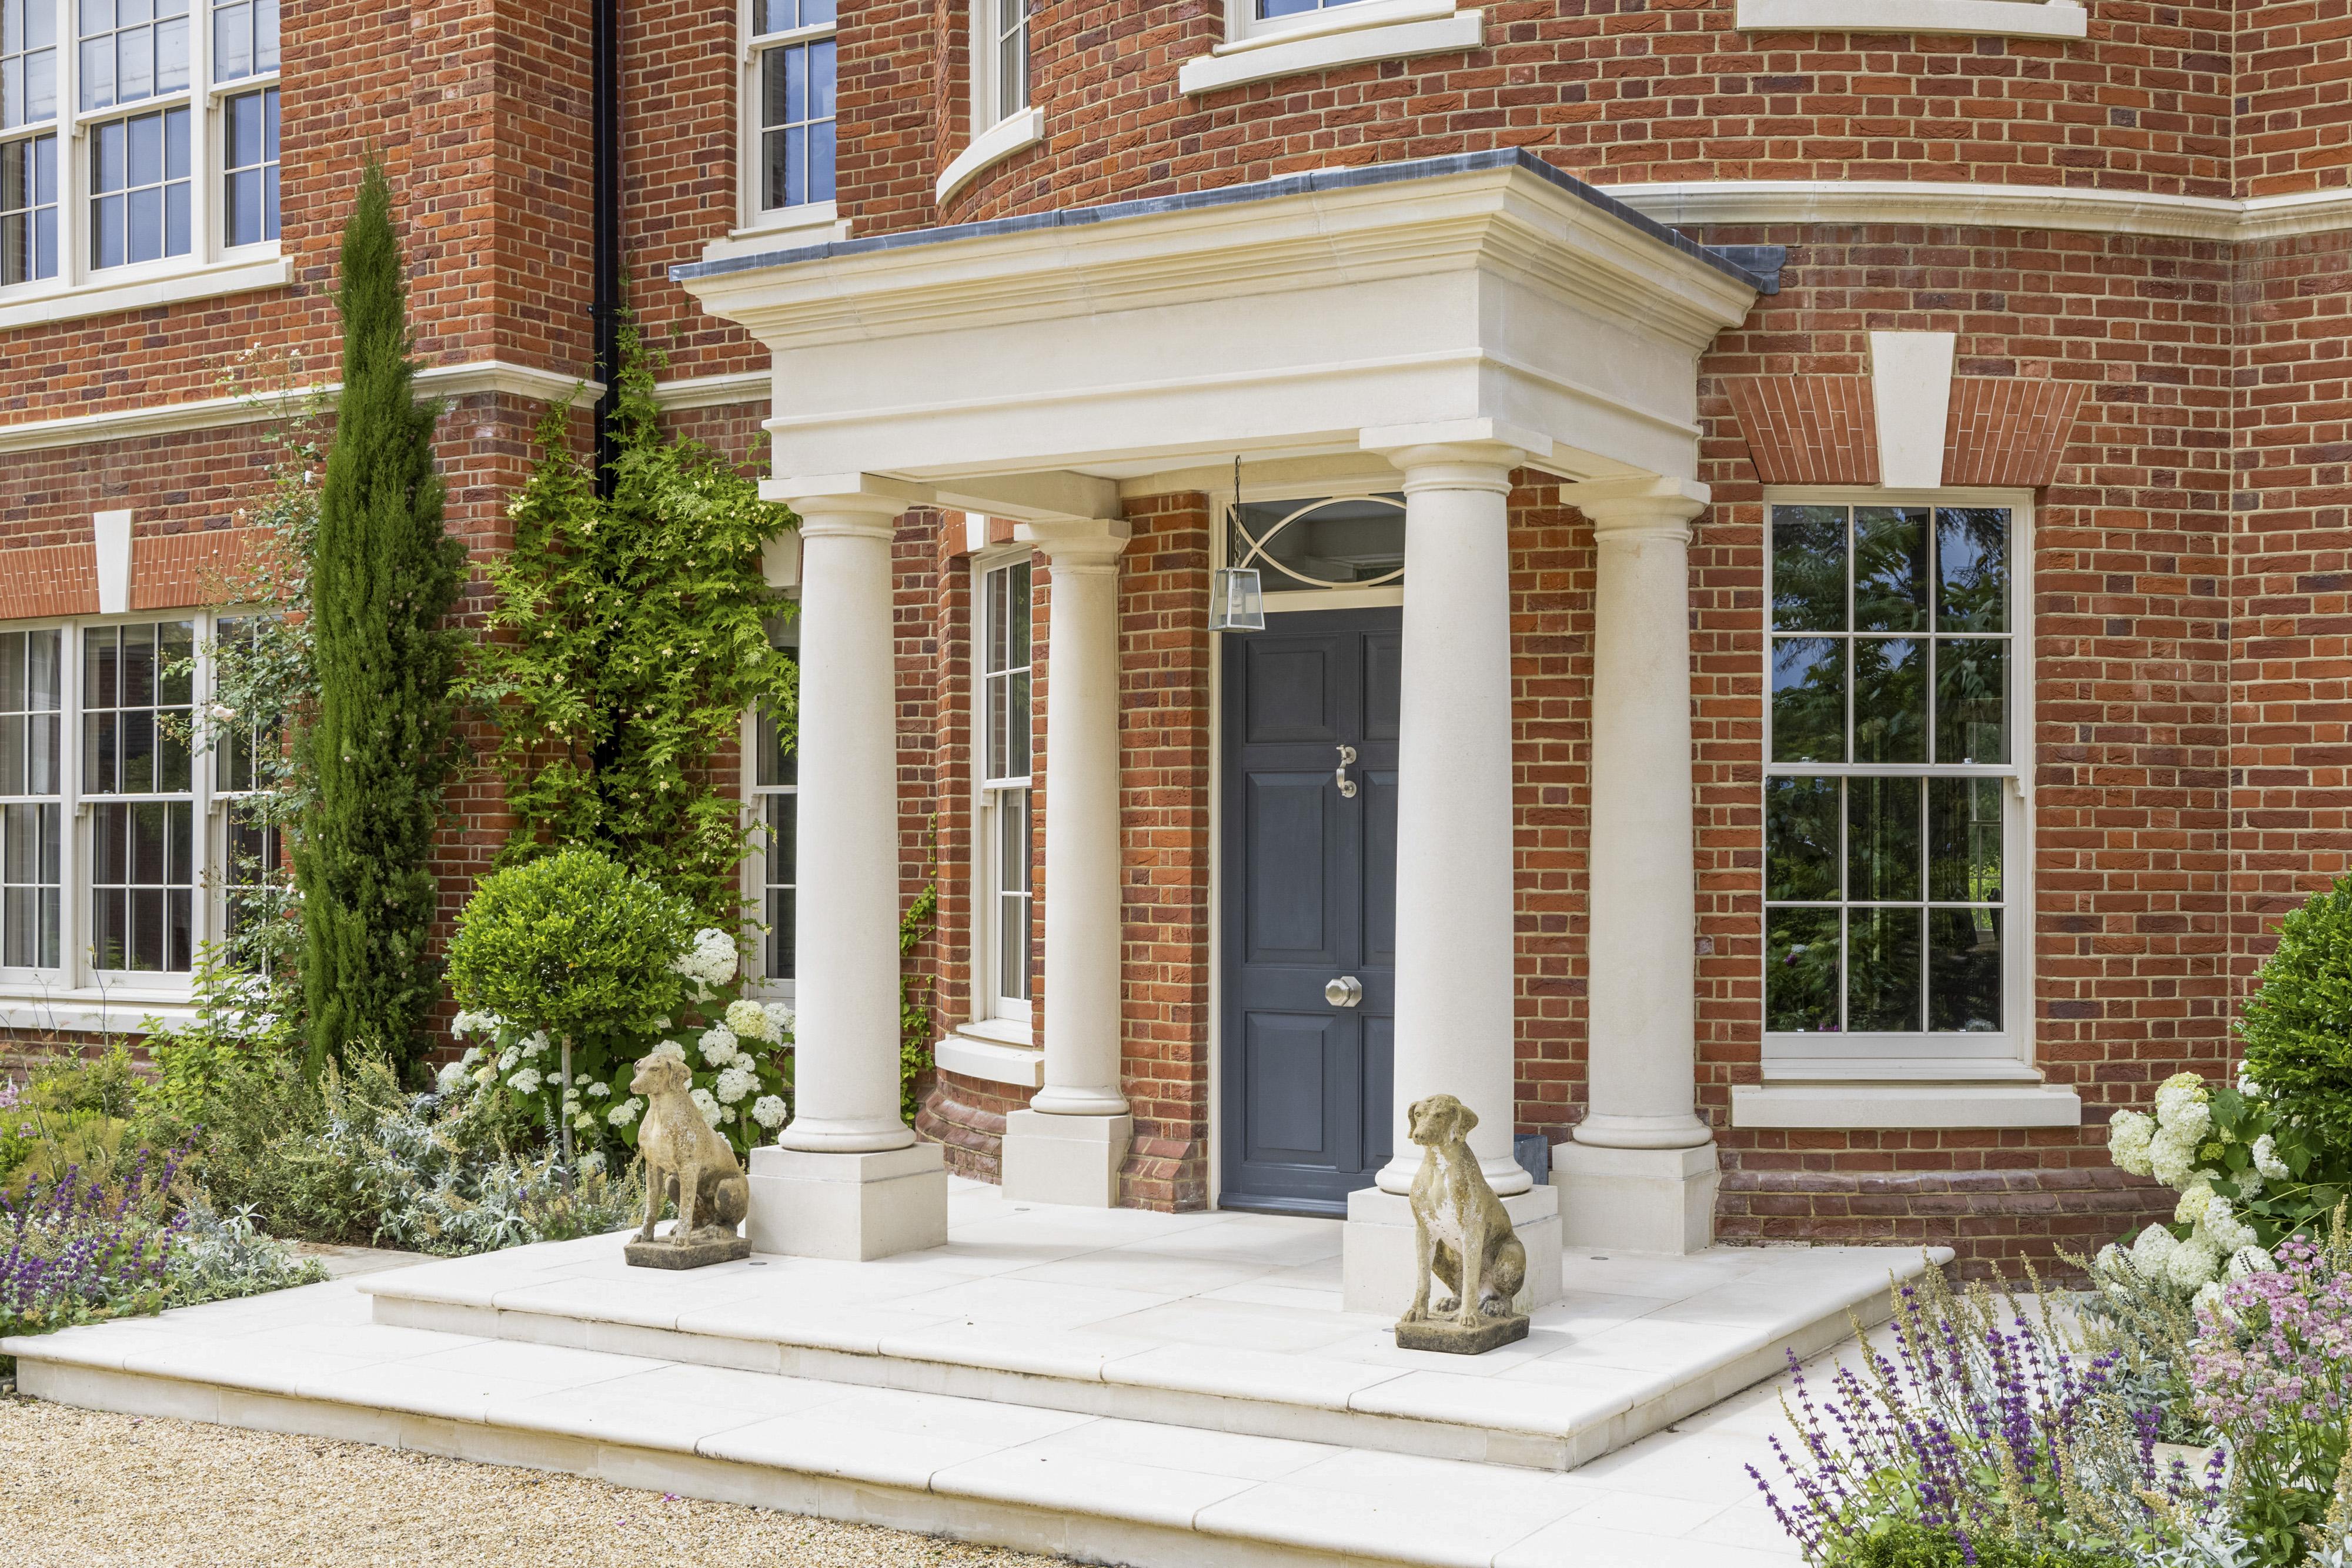 A red brick home with white stone portico